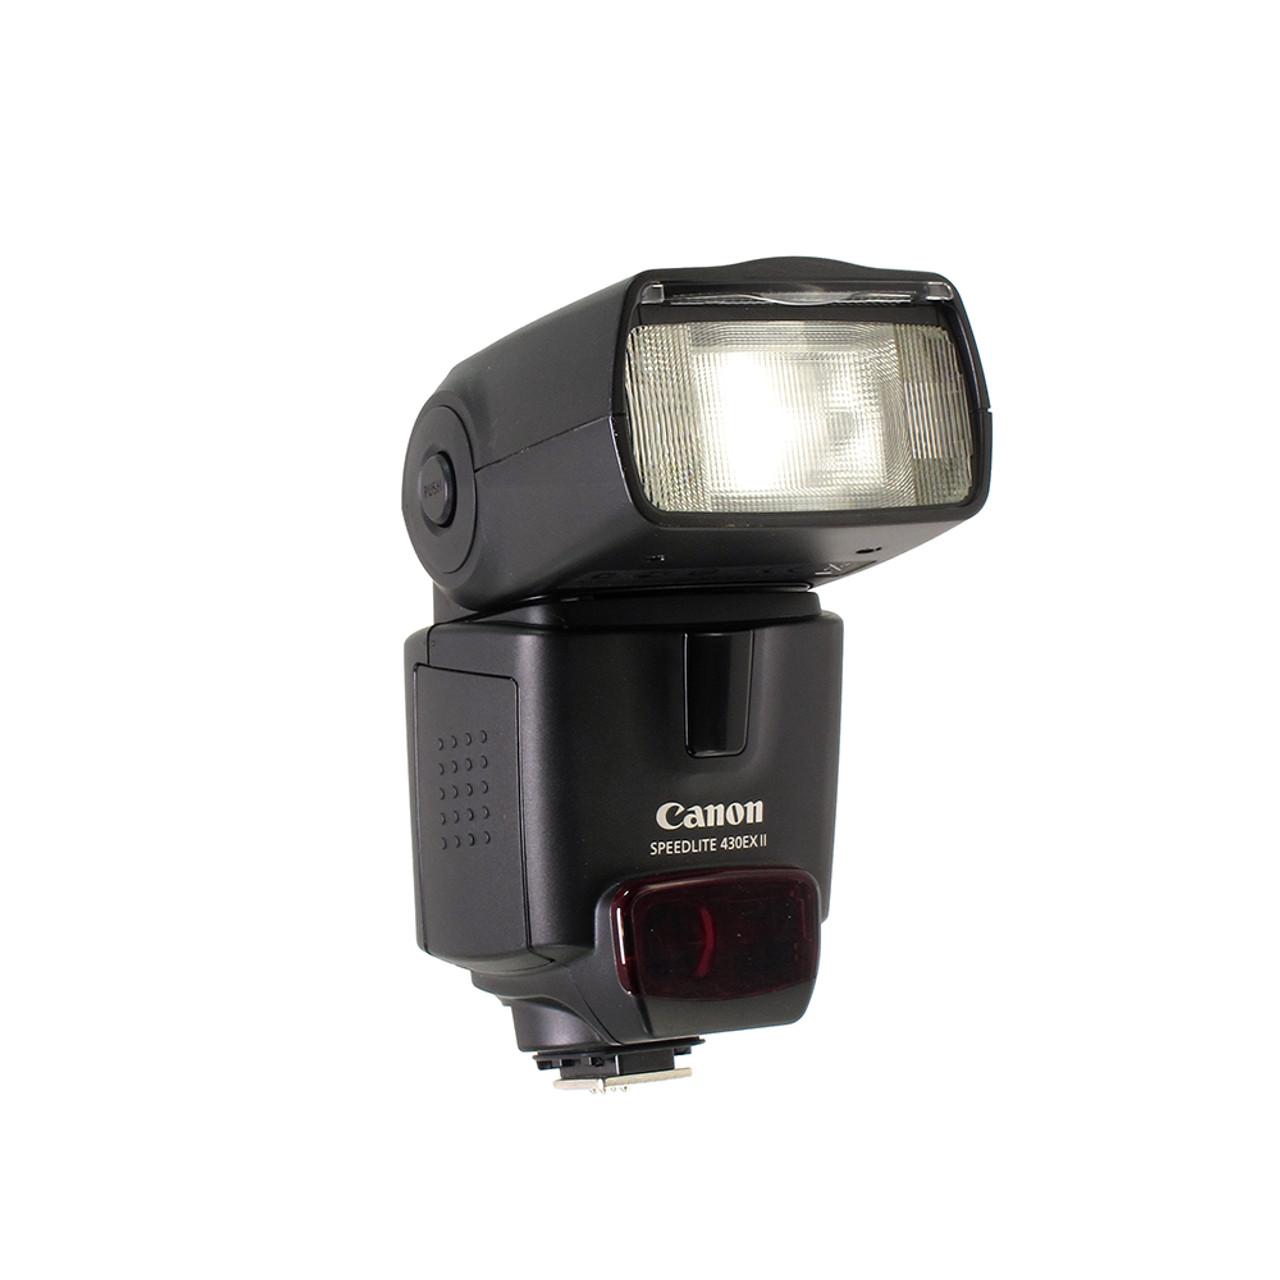 USED CANON 430EX II